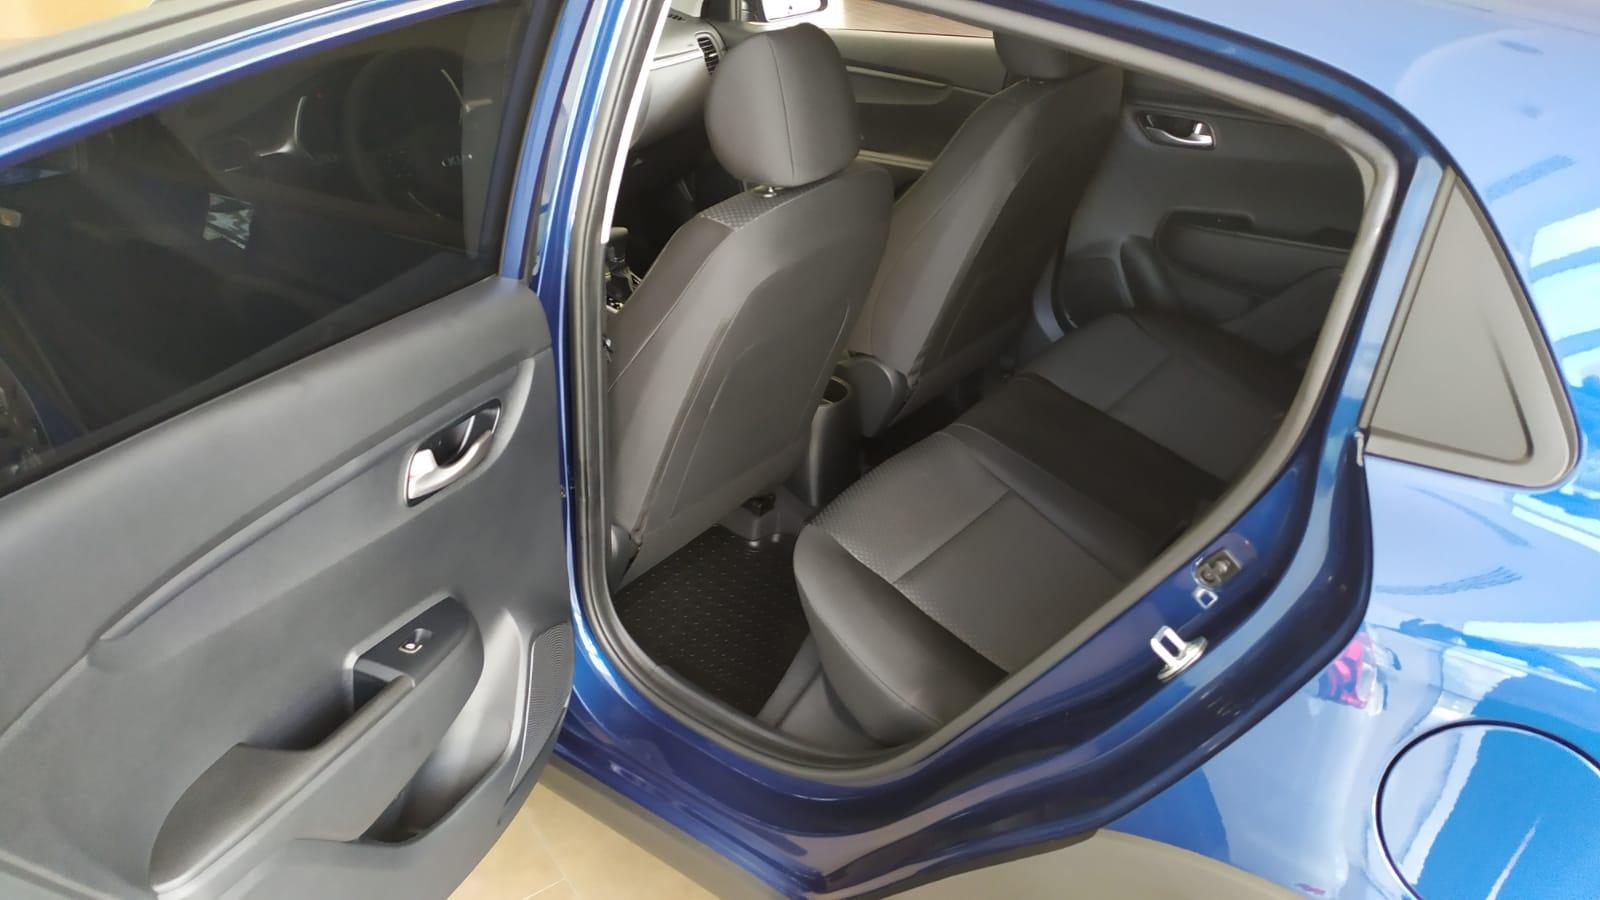 Kia Rio X Хэтчбек 1.6 л., 16-кл., (123л.с.) 6AT. Luxe. Синий «Marina Blue» 2021